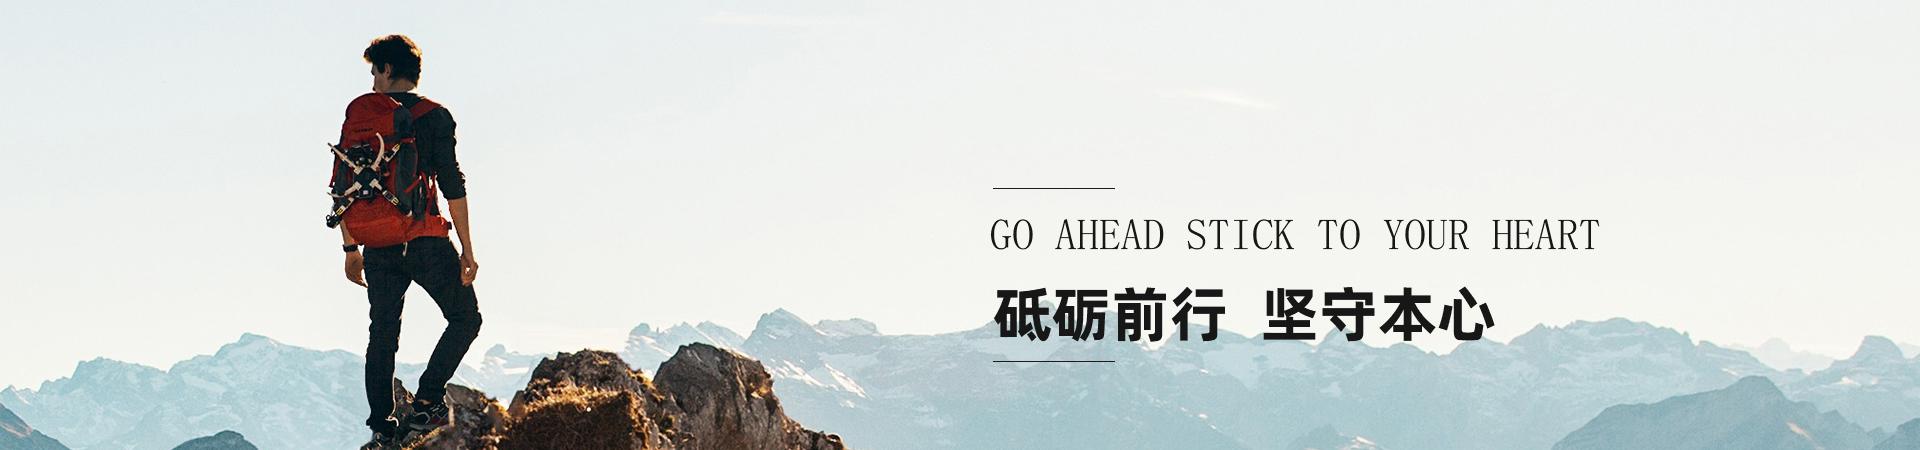 http://www.zhshengrui.com/data/upload/201911/20191116165109_198.jpg